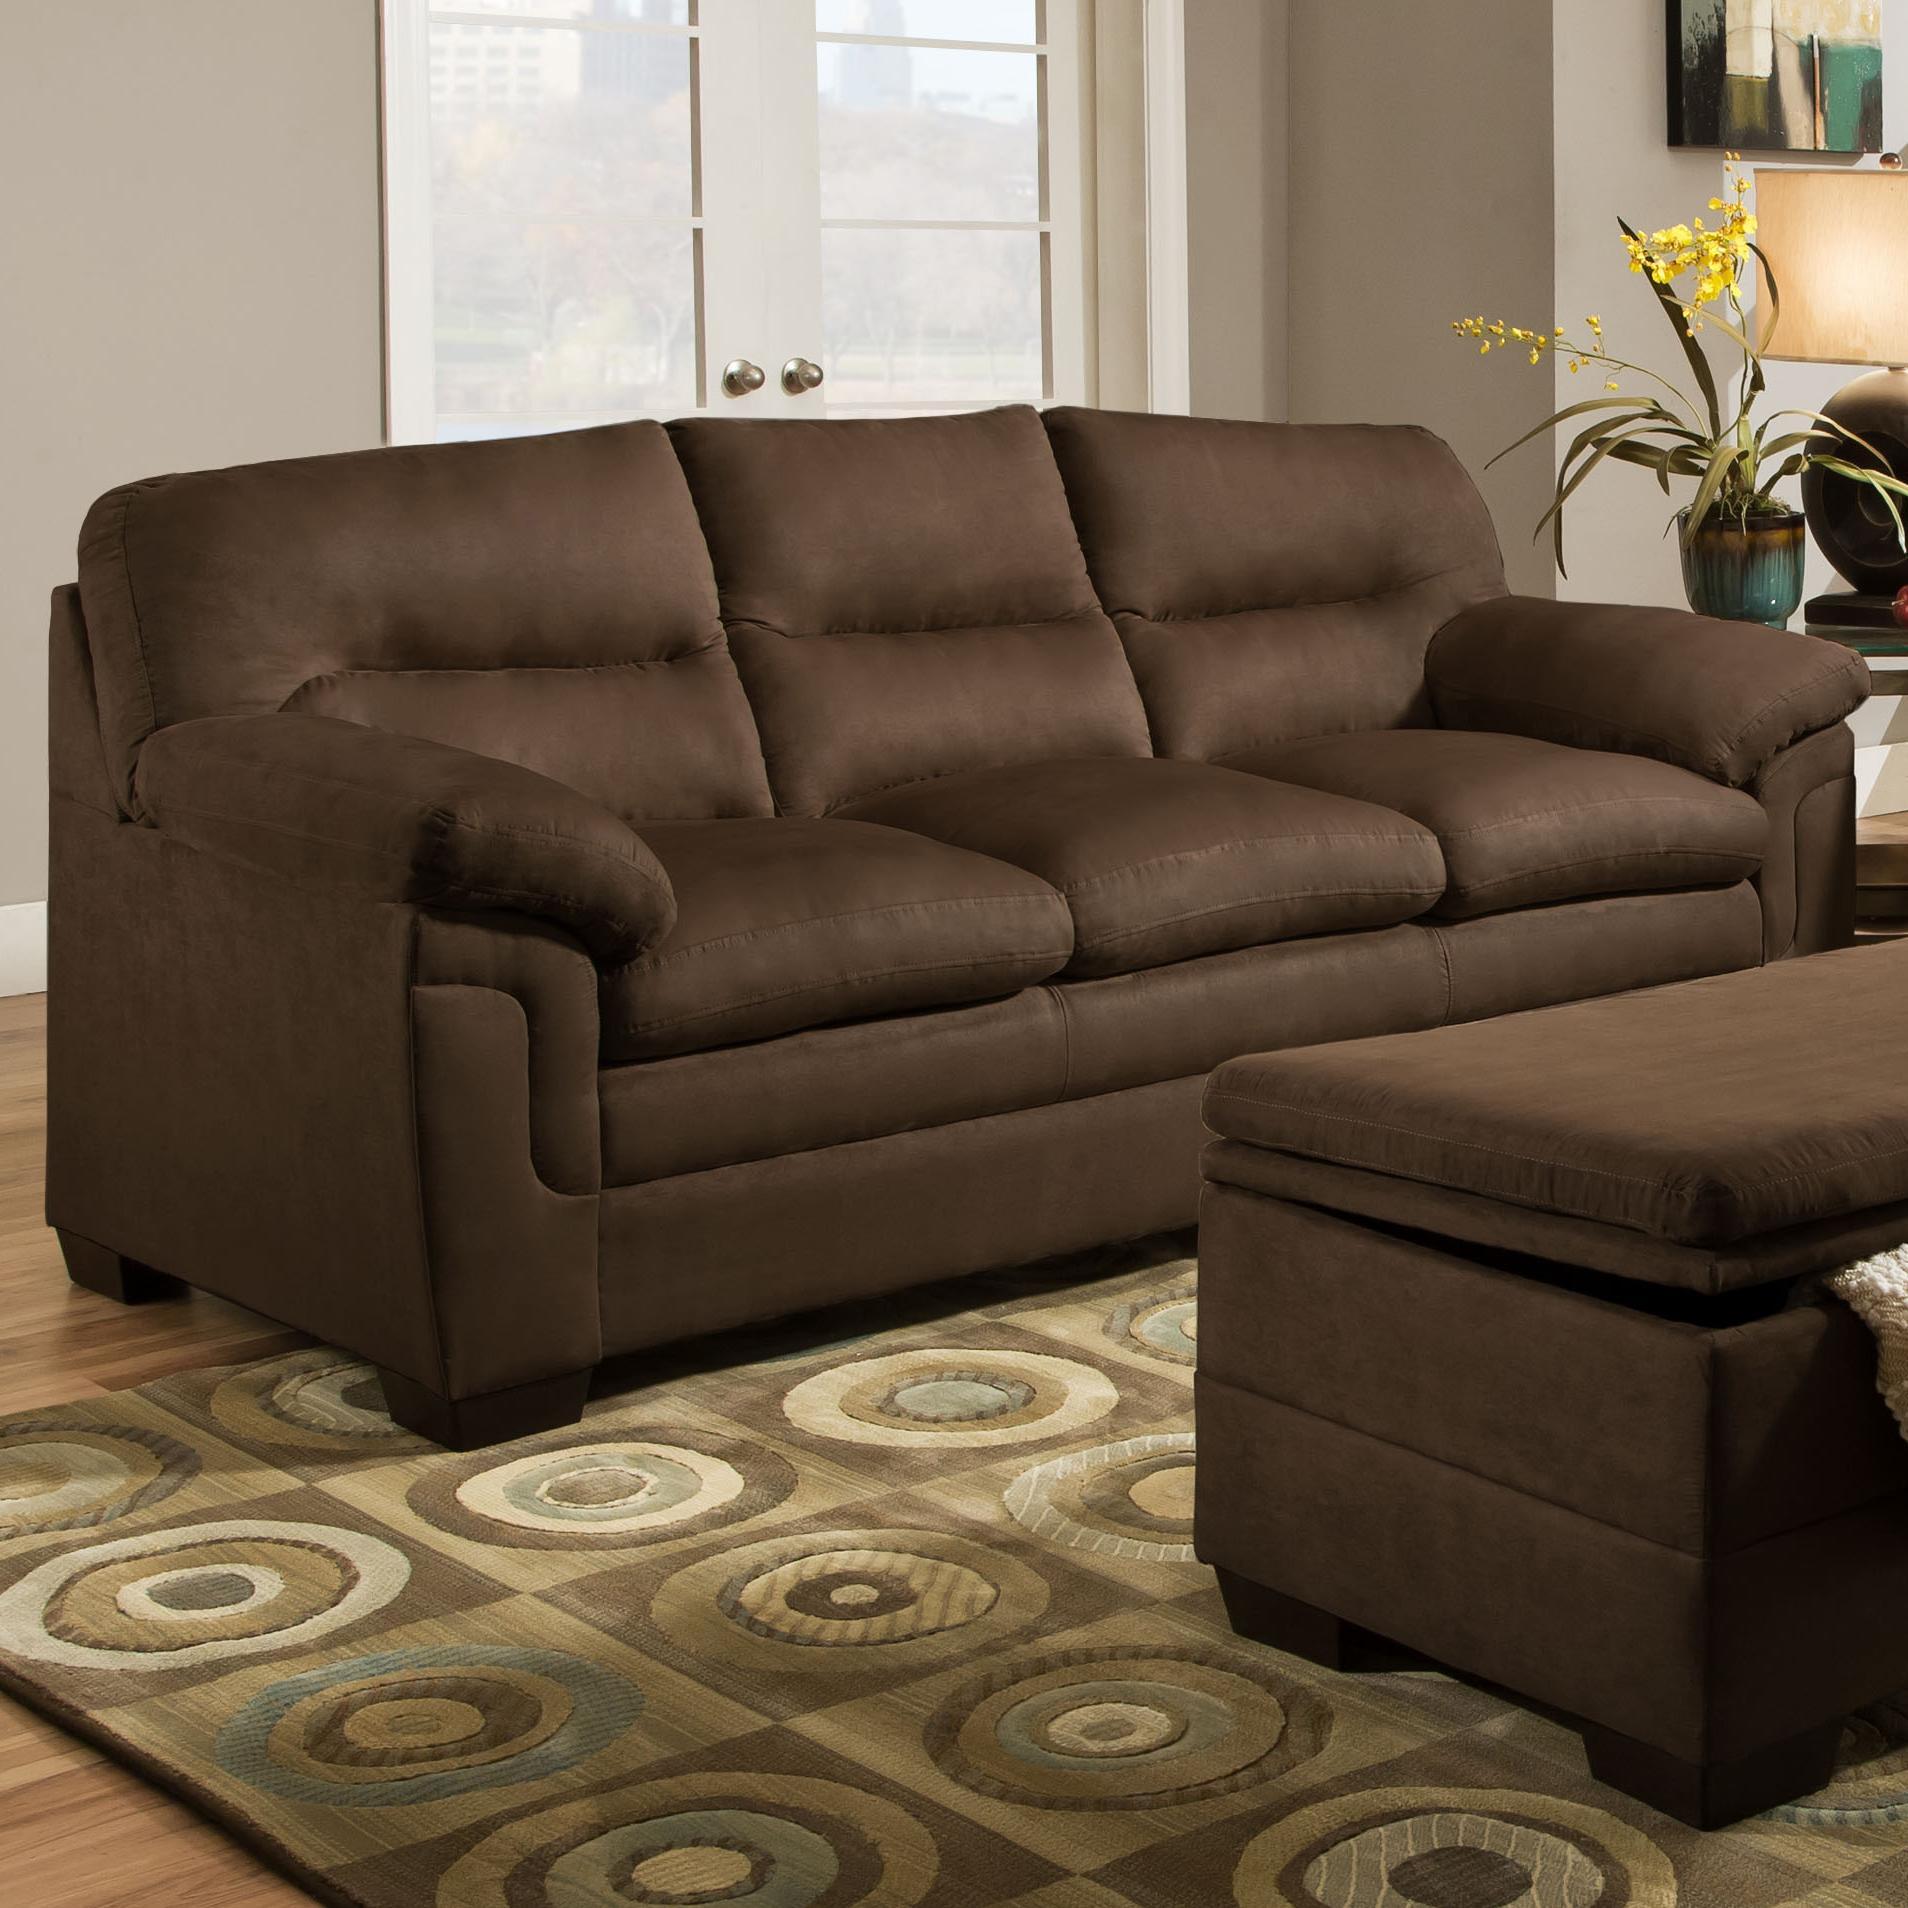 Simmons upholstery 3615 3615sofa casual stationary sofa for Plush living room furniture